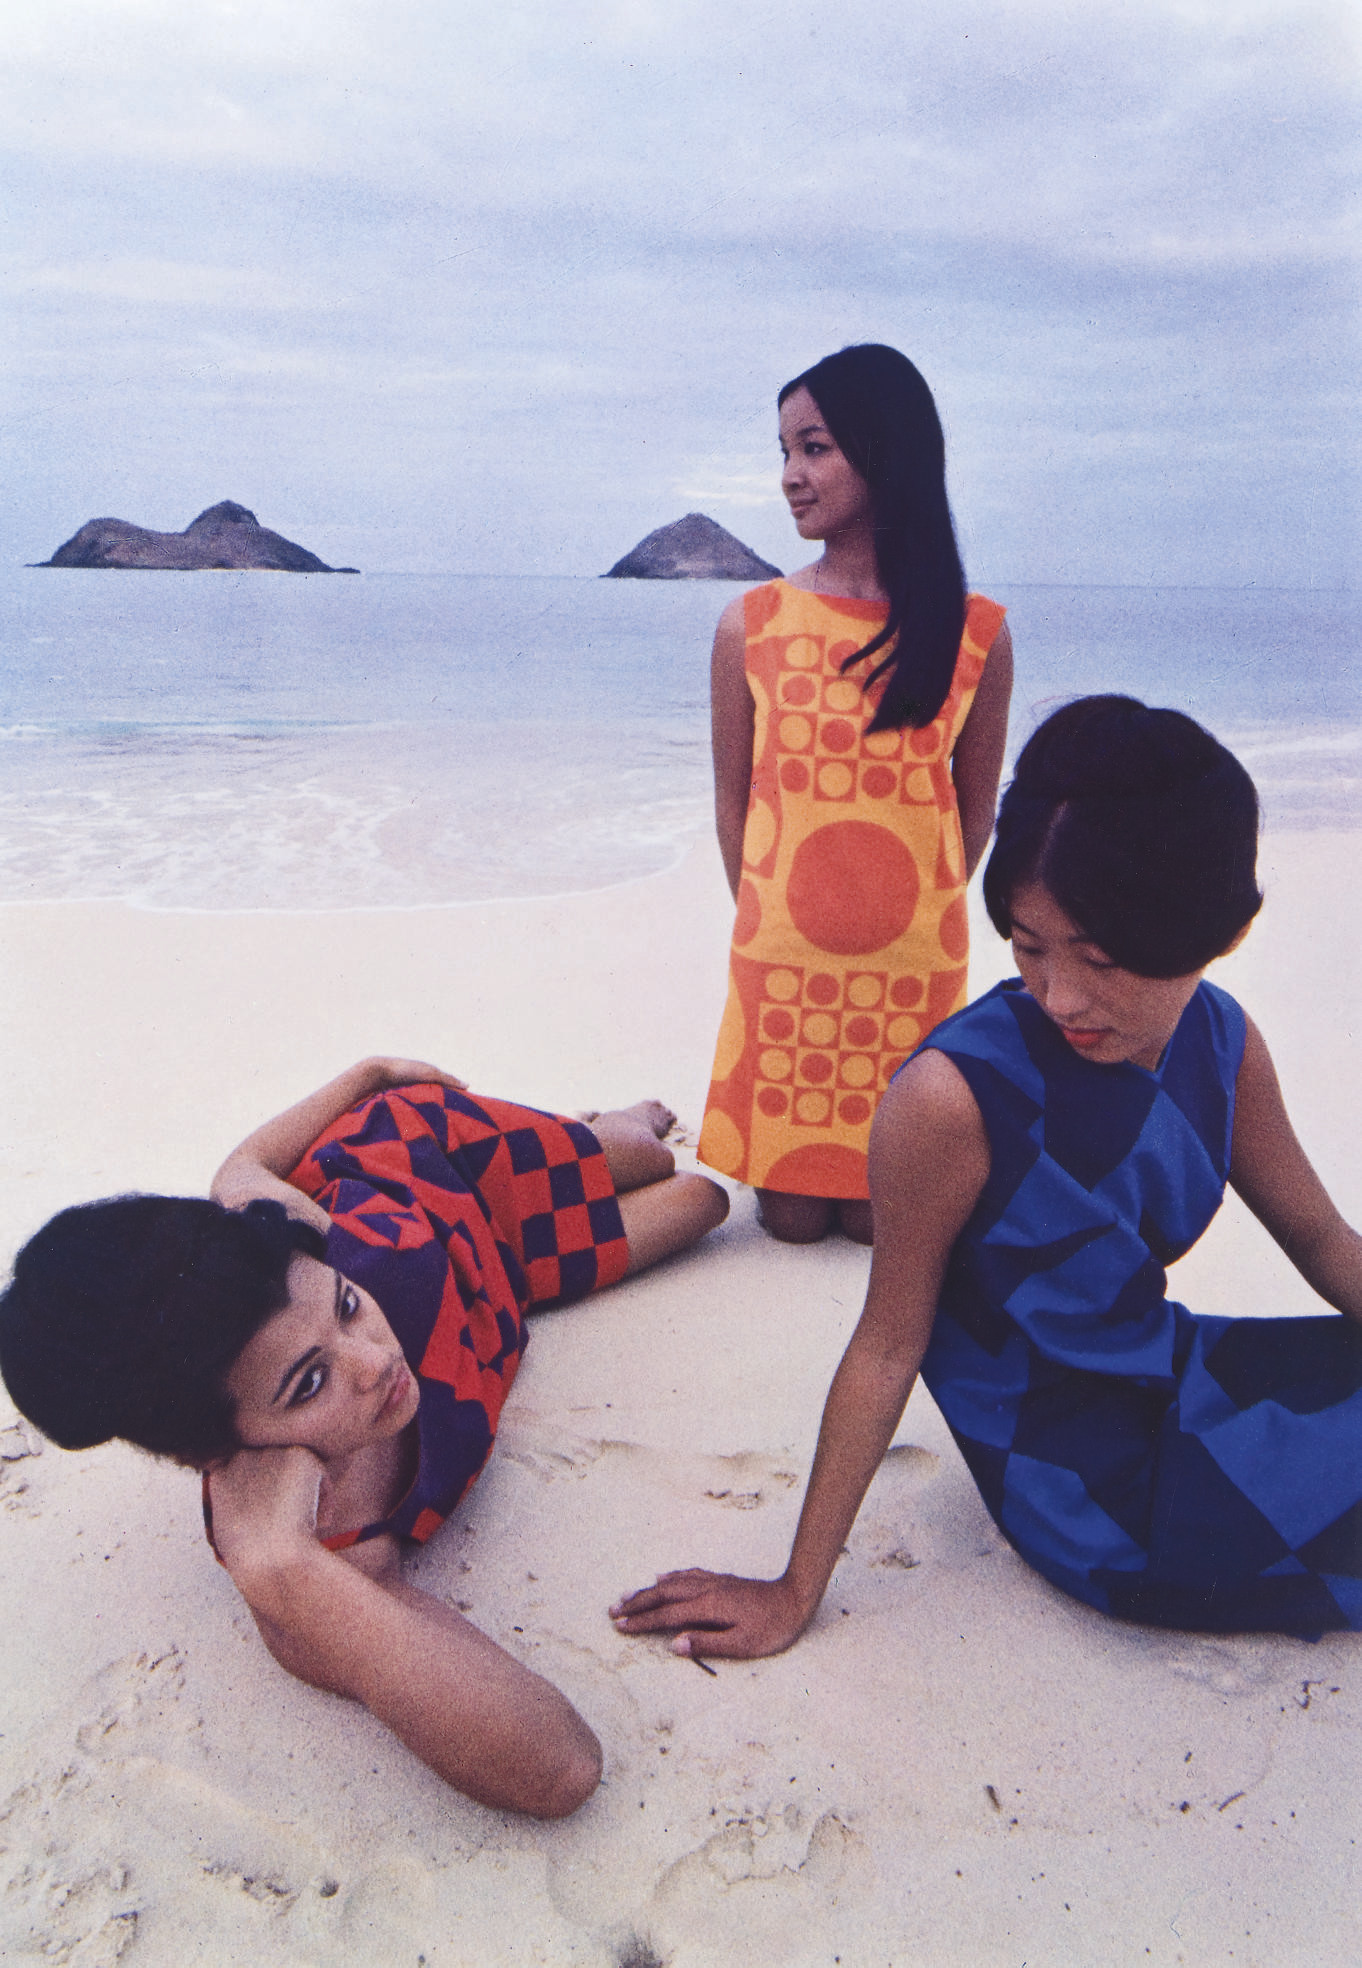 School Girls, Hawaii, Mademoiselle, 1963